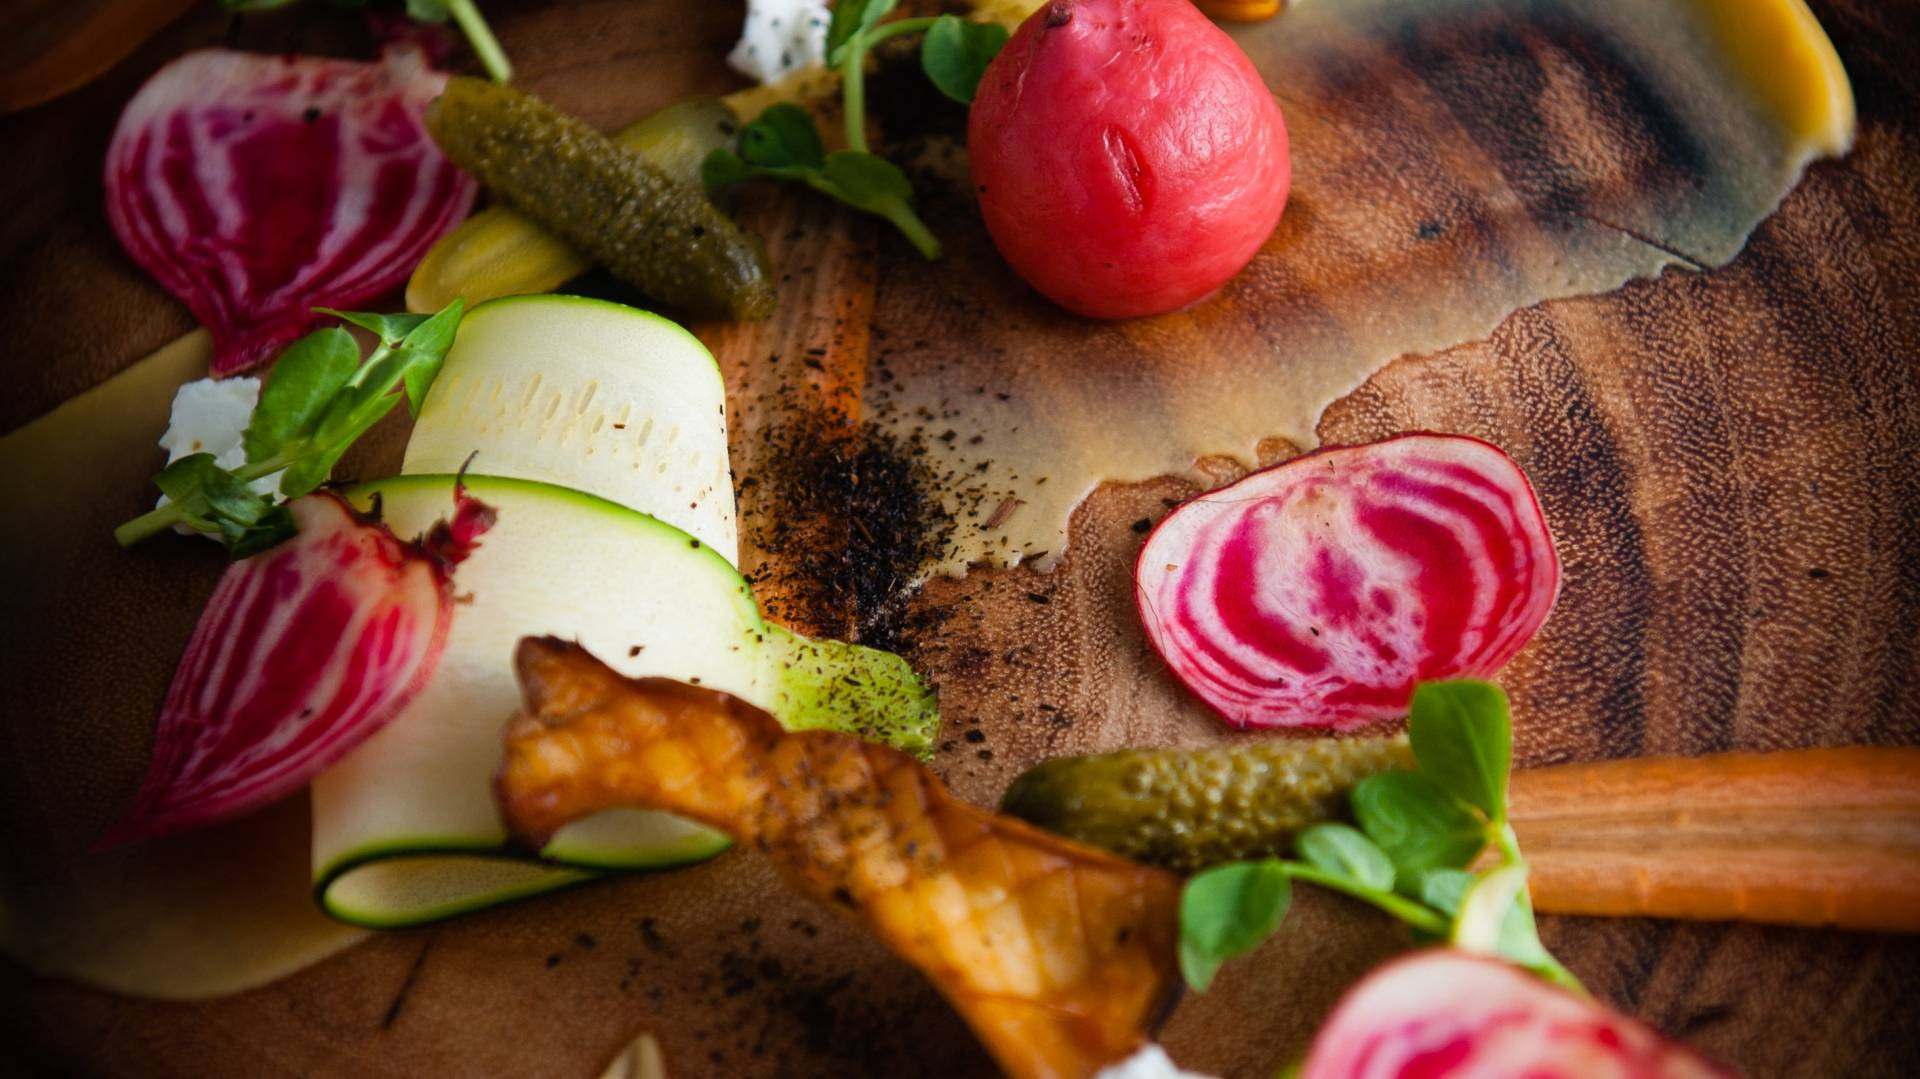 Vegetabe Salad